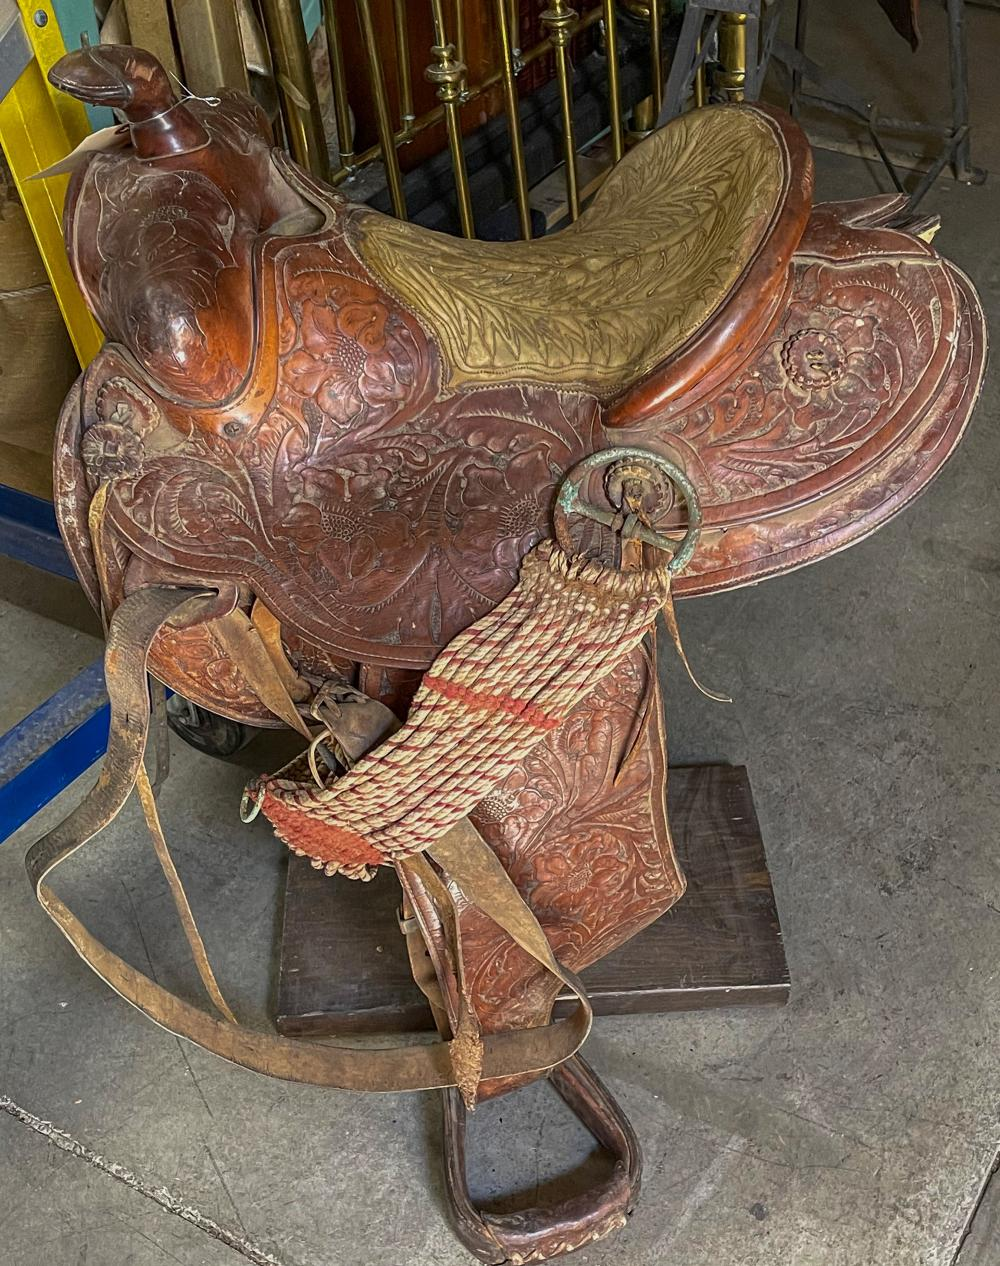 Western Tooled Saddle w/Padded Seat - Small [124495]